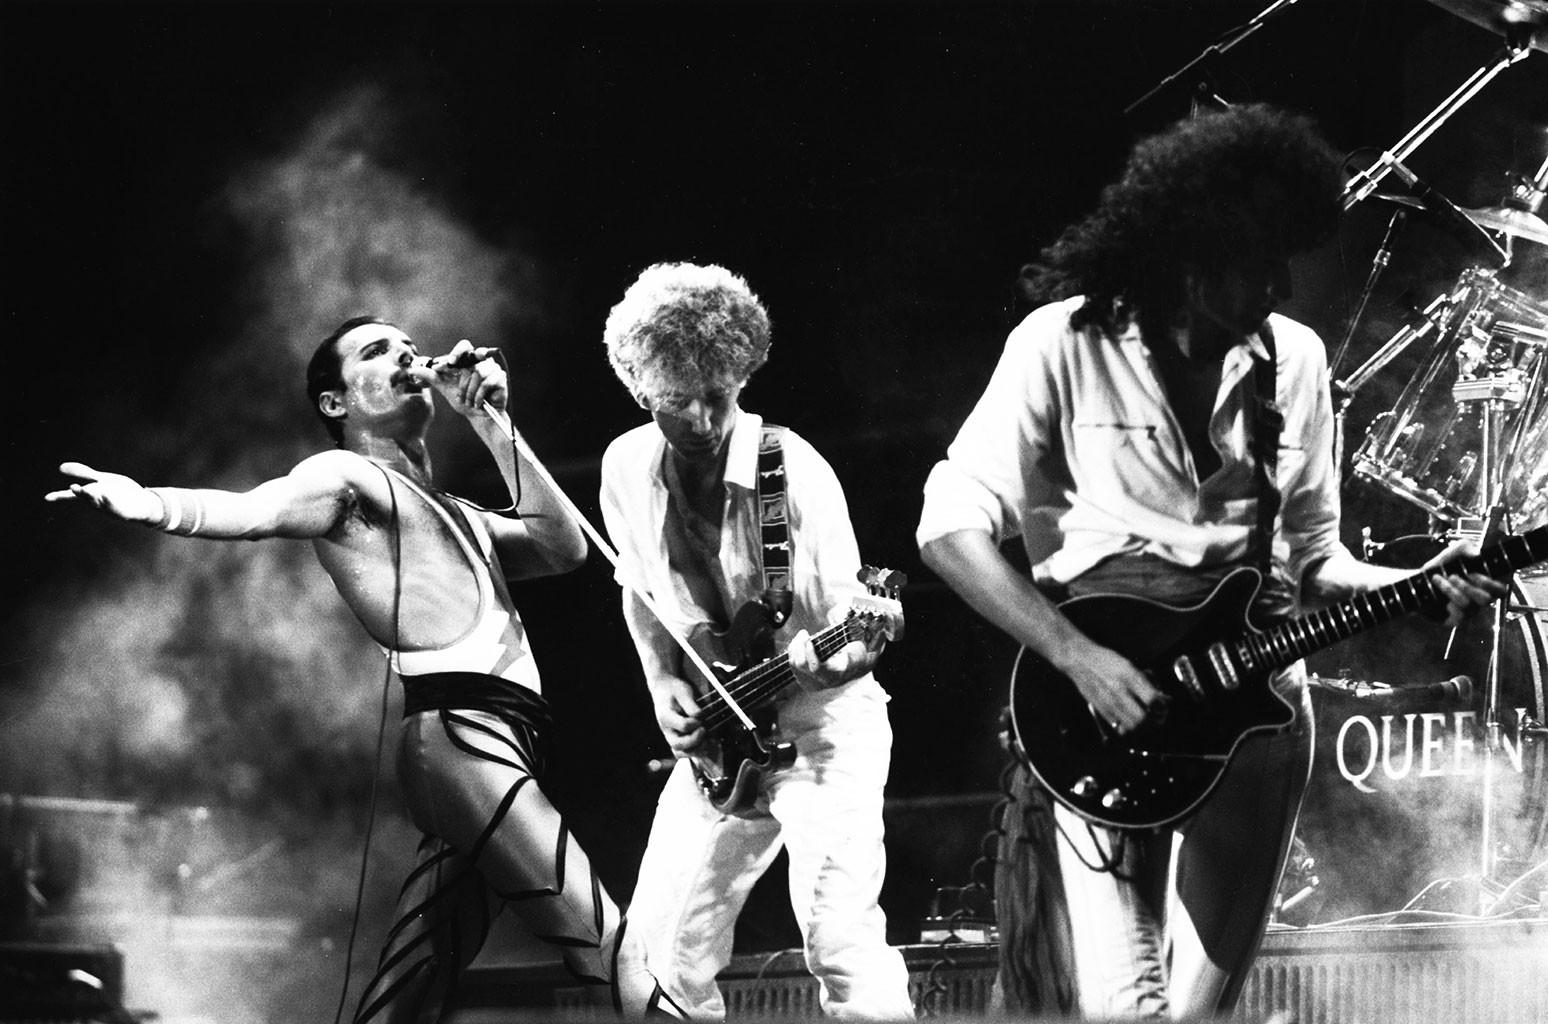 Freddie Mercury, John Deacon and Brian May of Queen